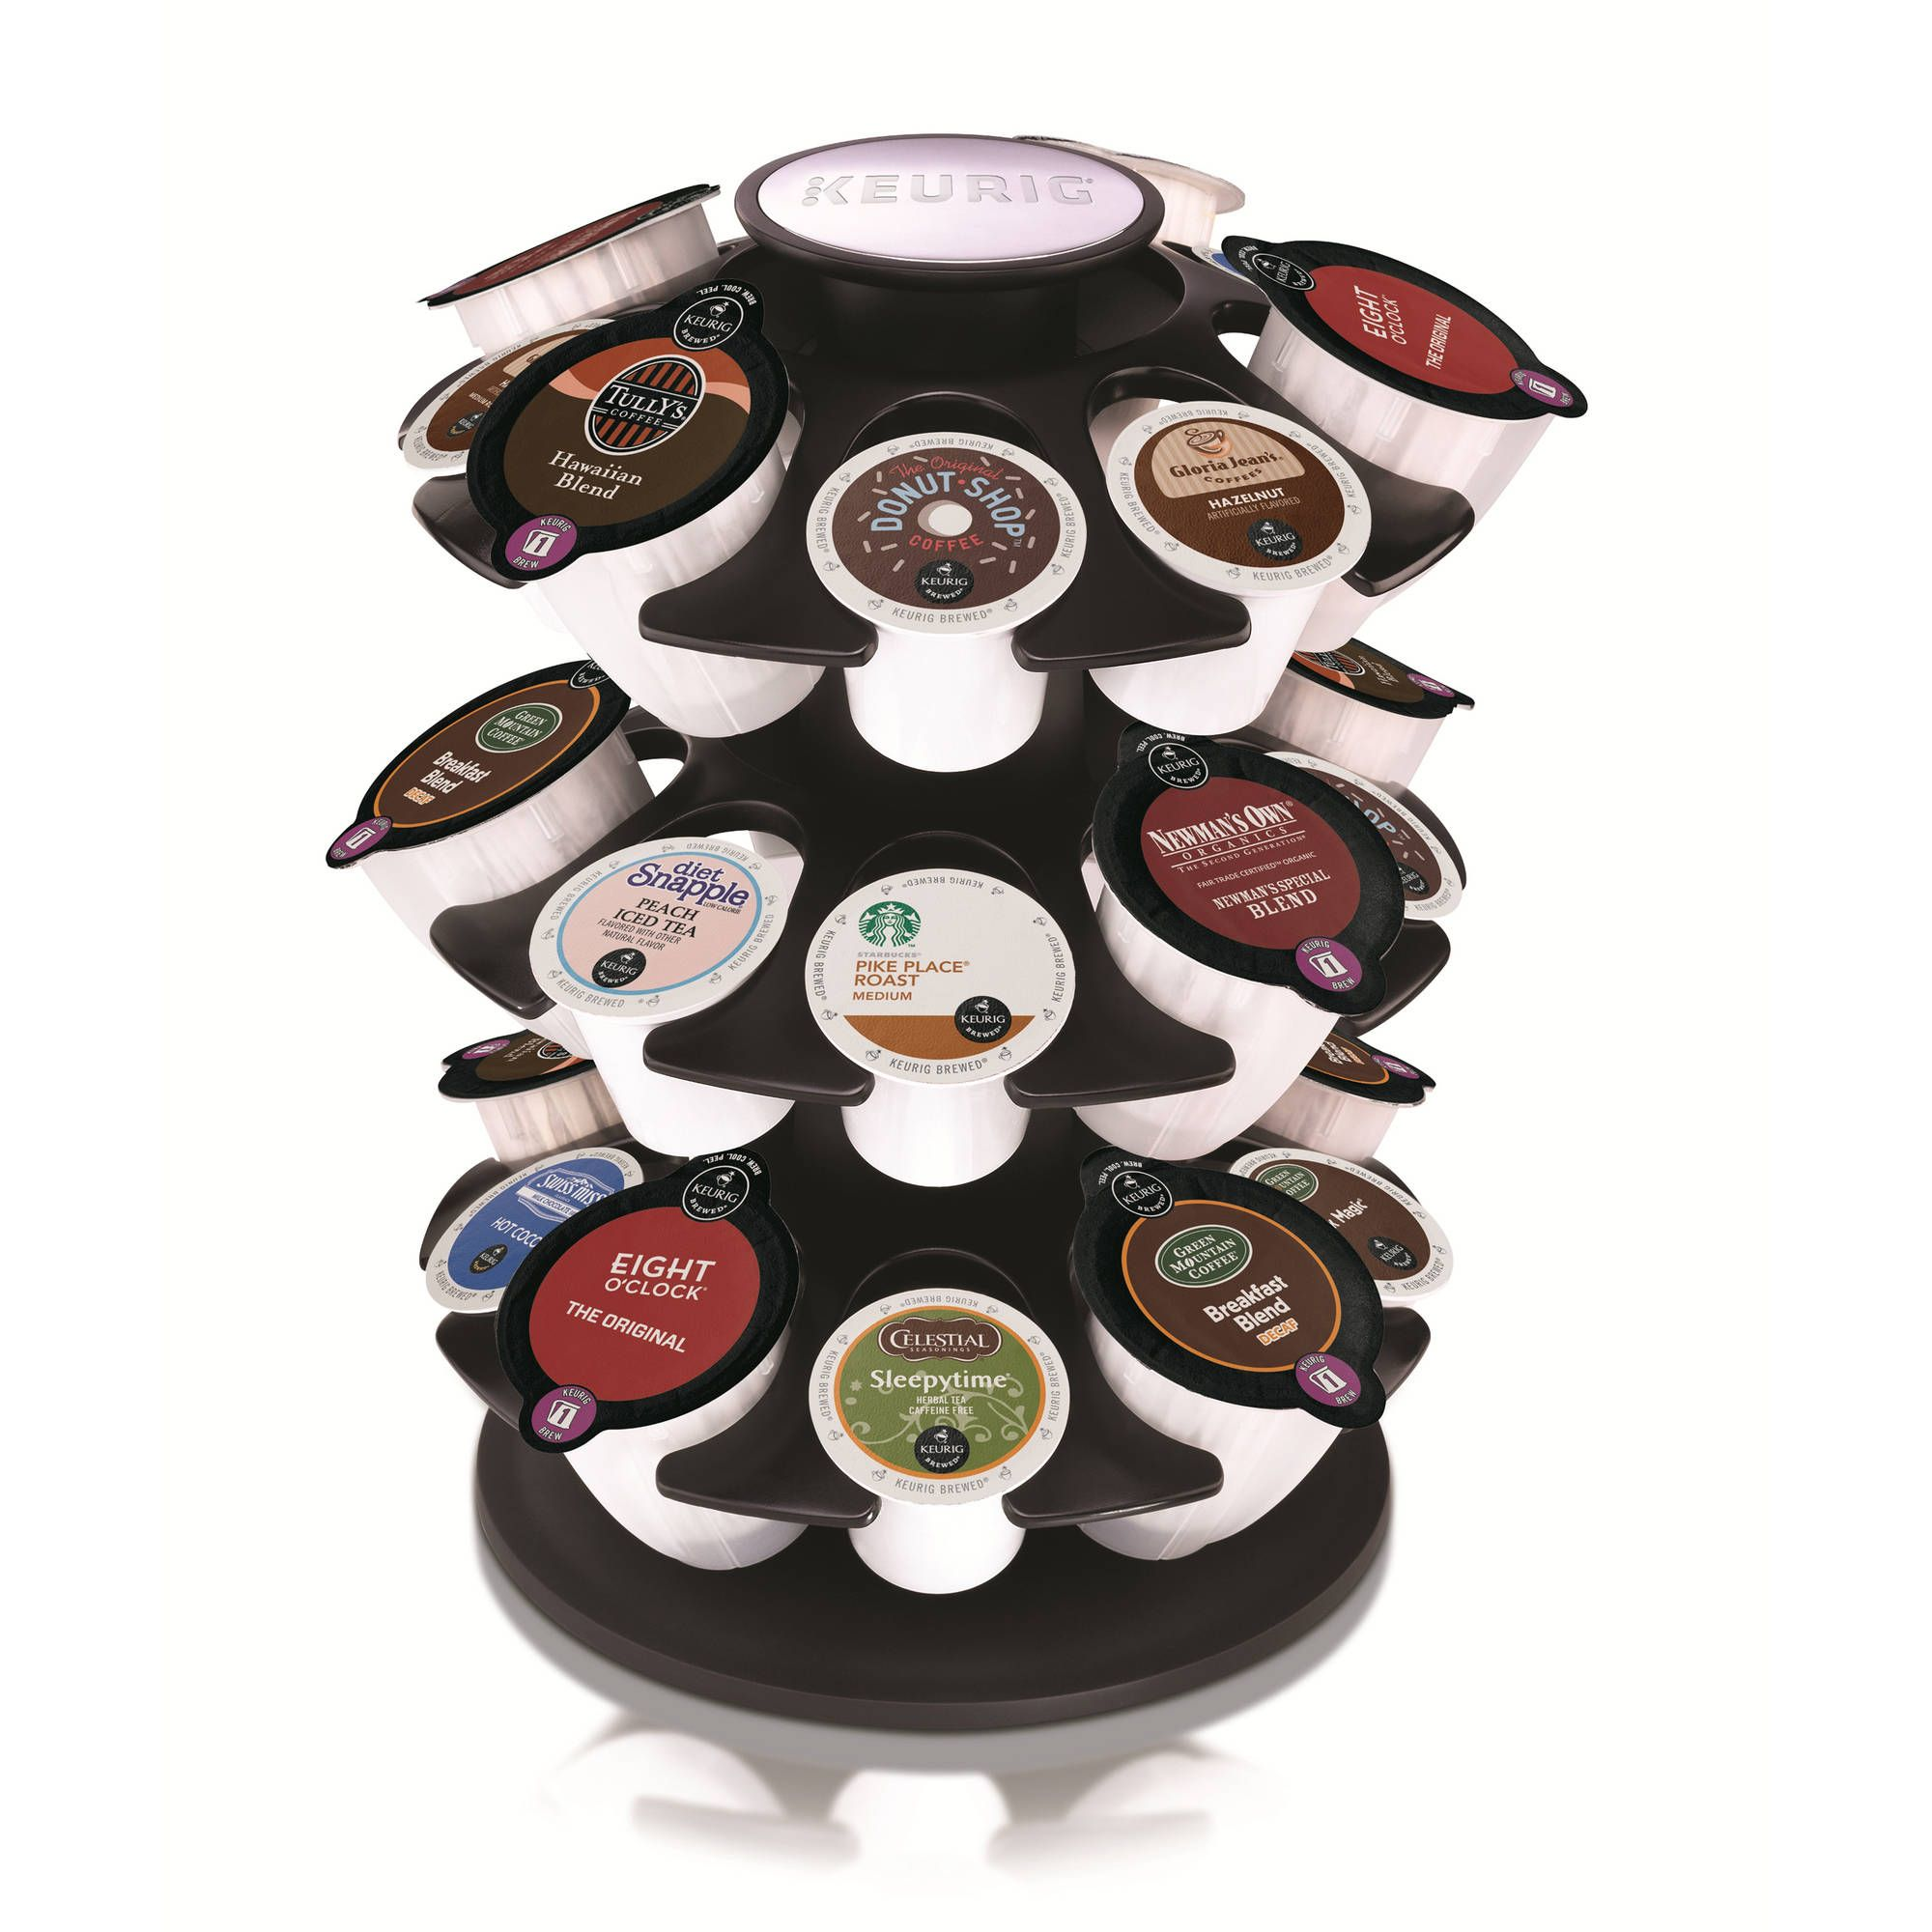 Home Keurig, Pod coffee makers, Coffee pods